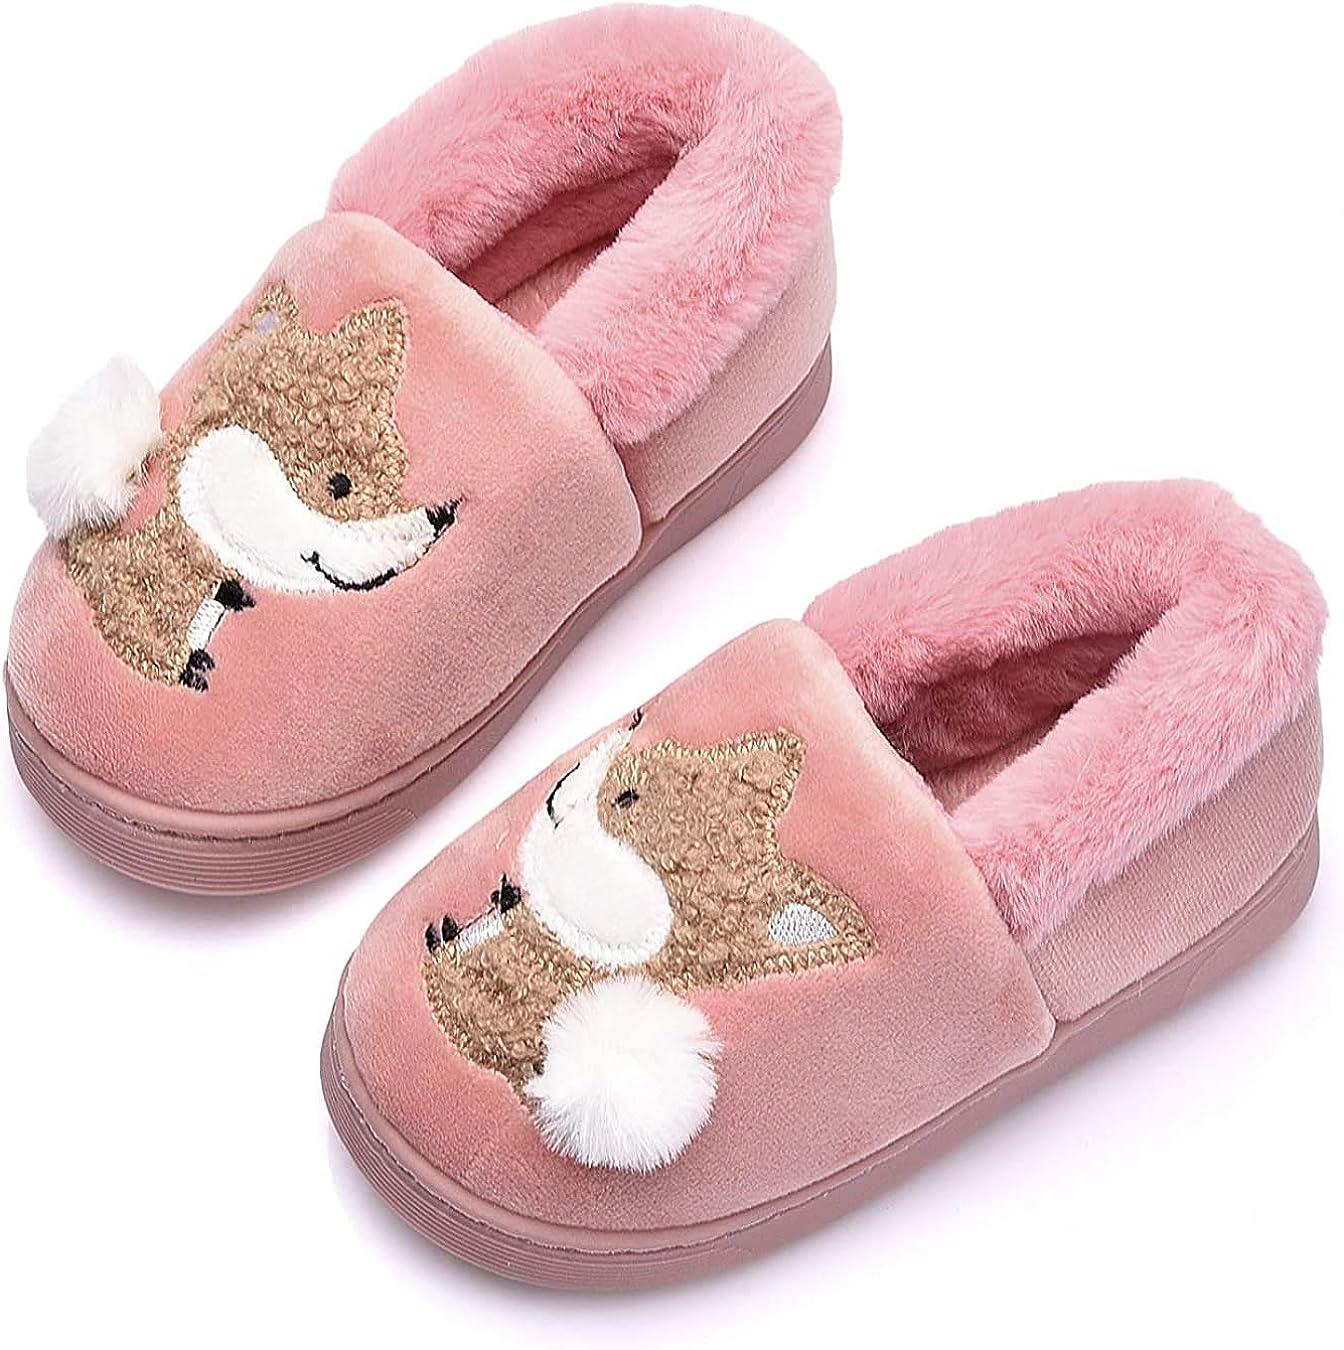 THAIHOEY Boys Girls Toddler House Slippers Warm Winter Slippers